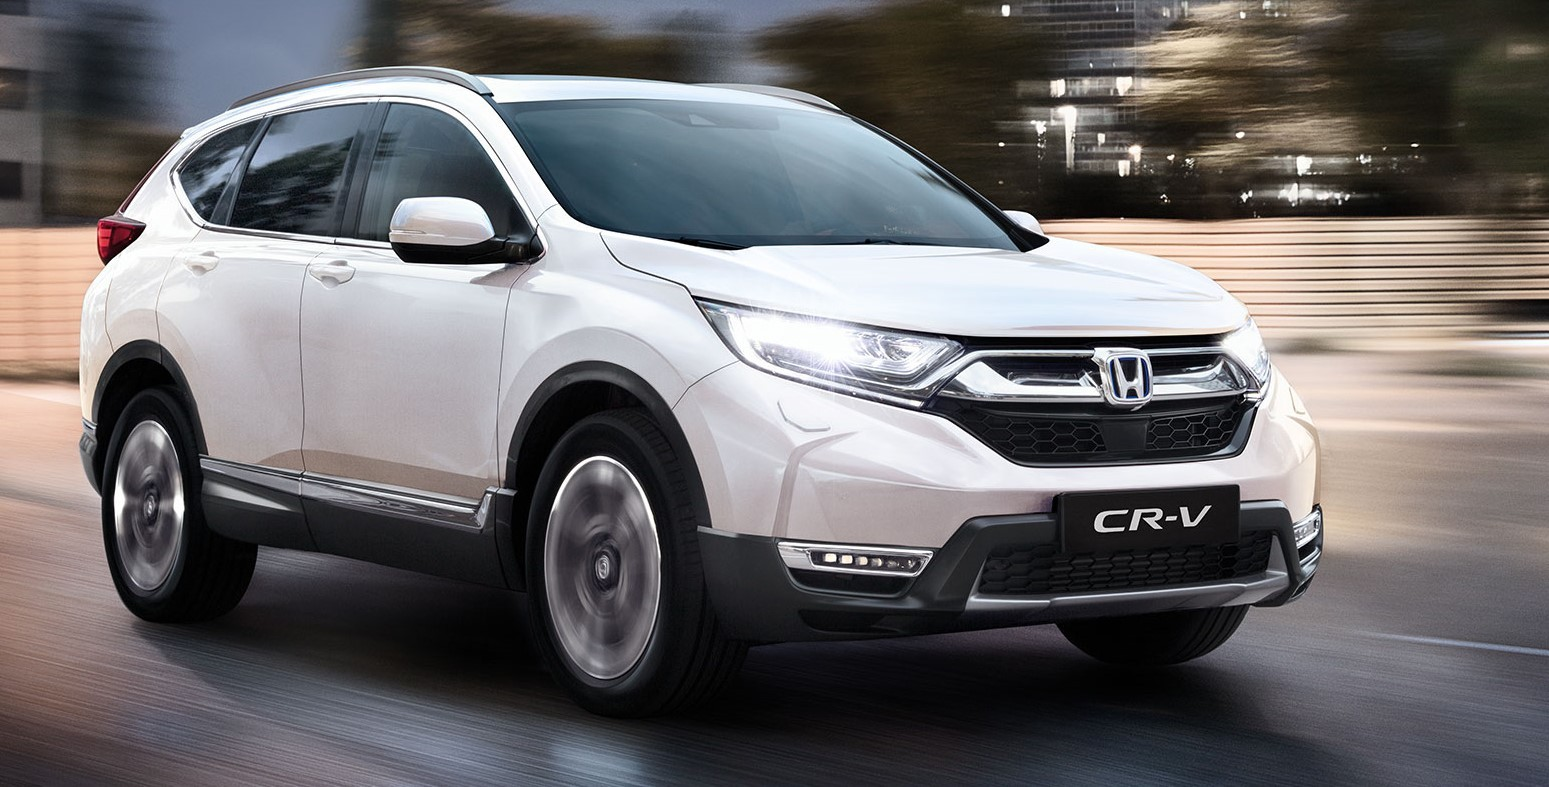 Honda CR-V refresh will impress